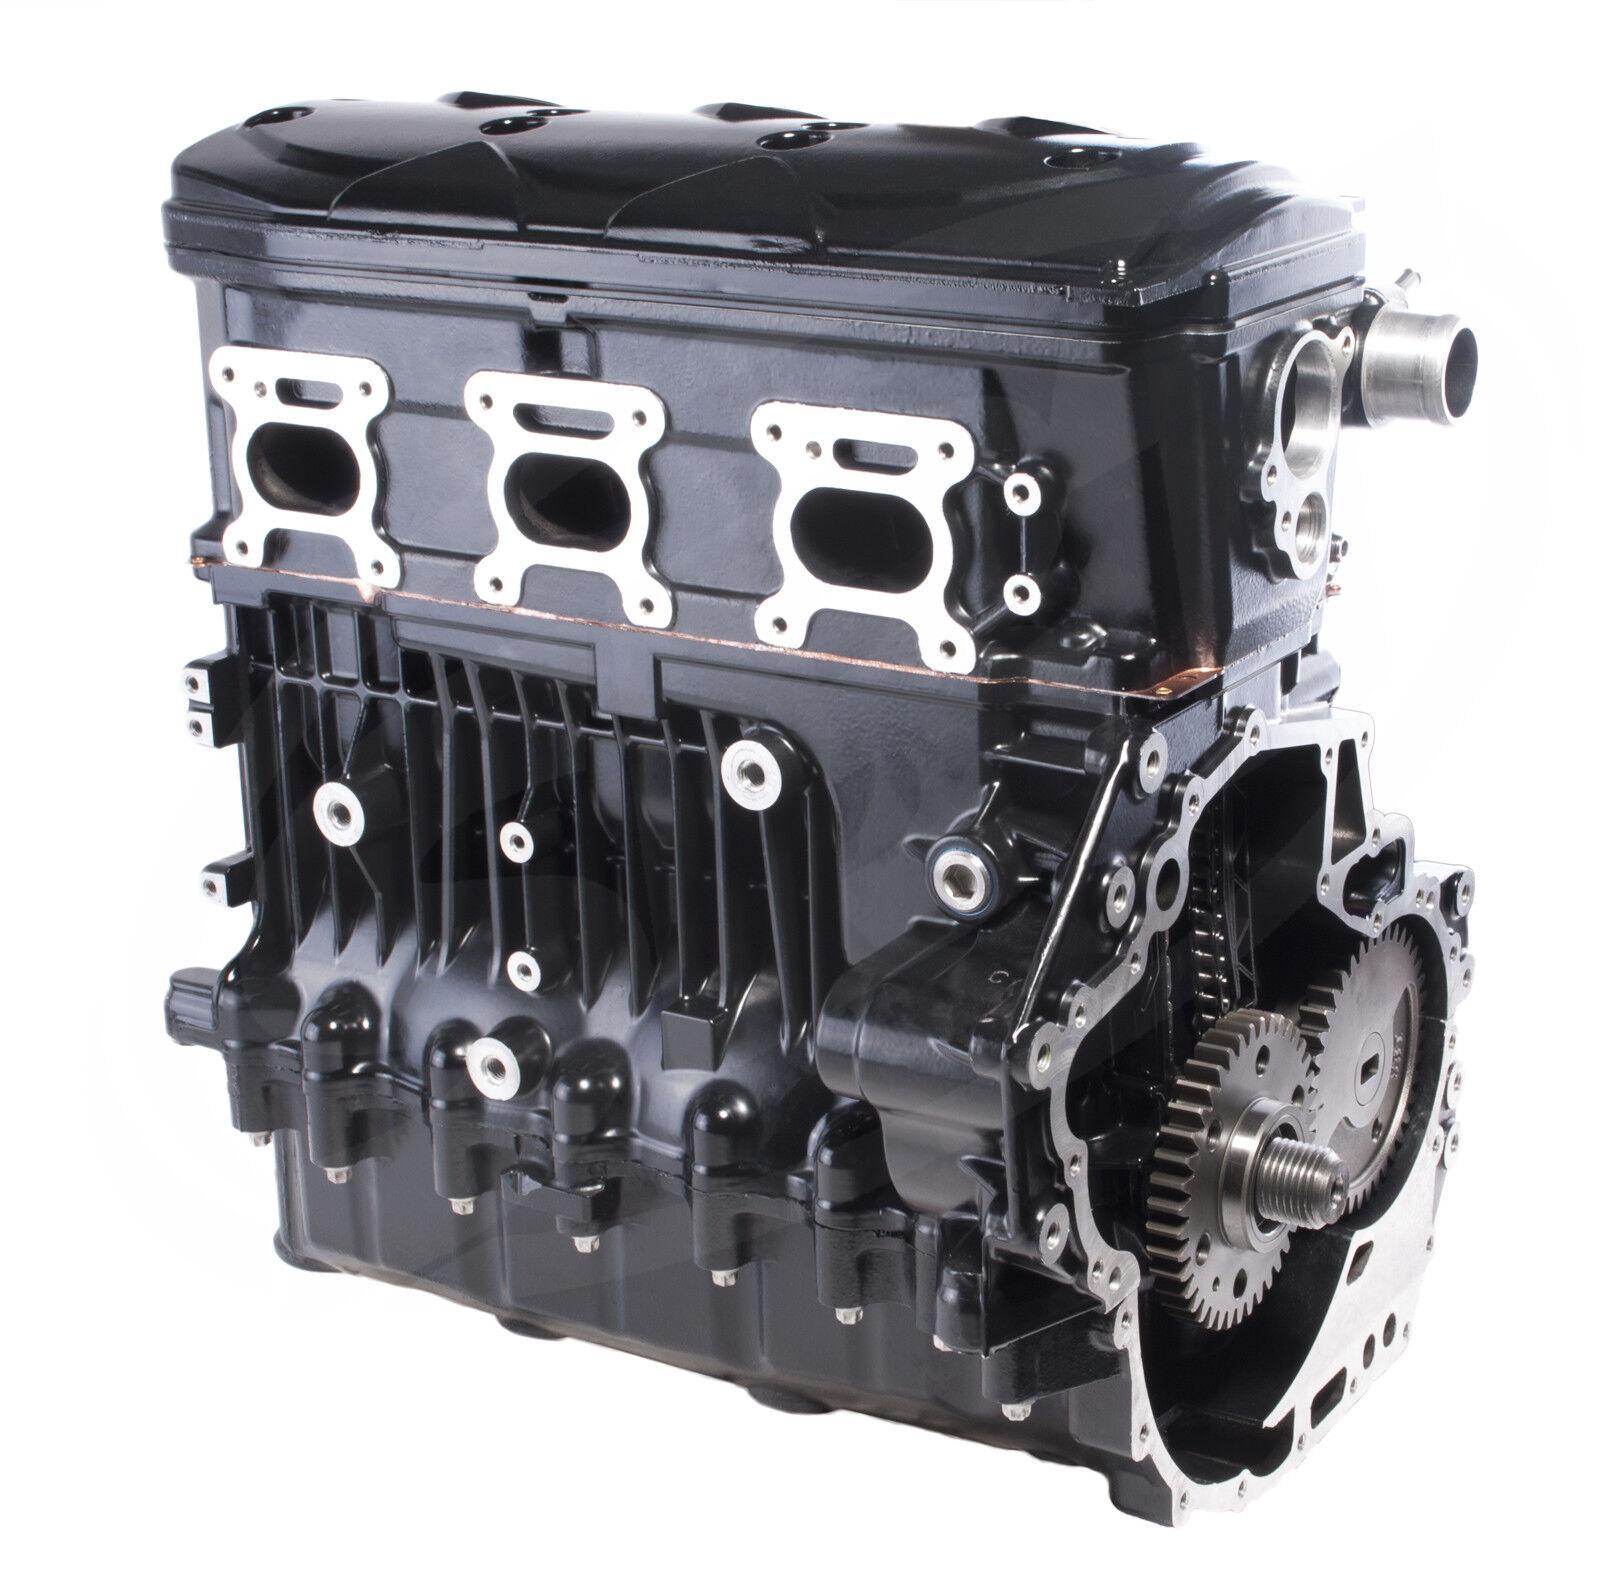 Sea-Doo Motor 2010 4-Tec 255 255 255 Se GTX Ist Rxp Rxt Wake Challenger Speedster Sbt ed8dda